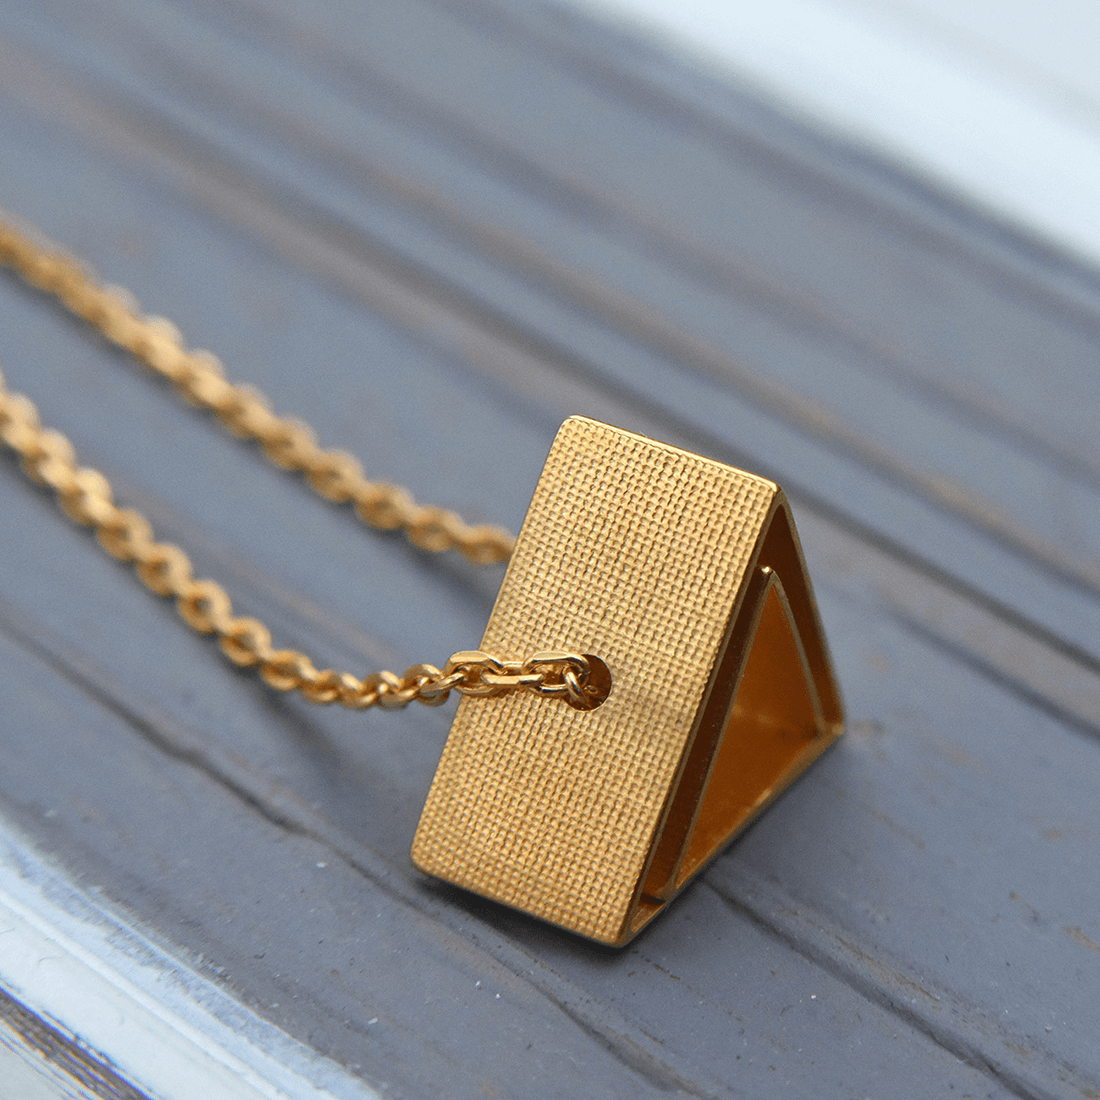 kei-tominaga-shape-in-shape-necklace-triangle-gold-6